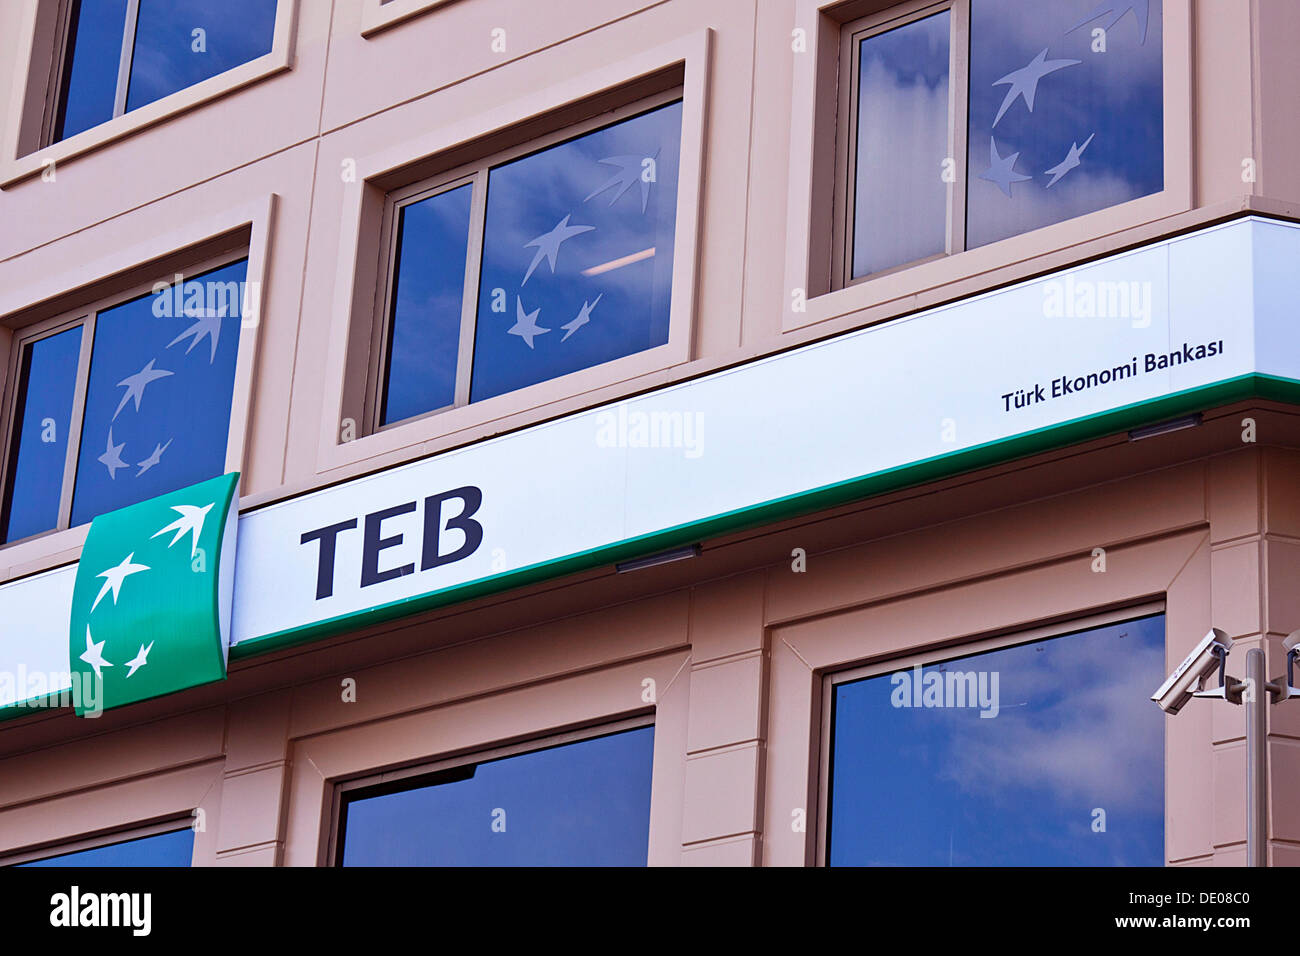 Branch of the TEB, Tuerk Ekonomi Bankasi or Turkish Economy Bank, Istanbul, Turkey - Stock Image